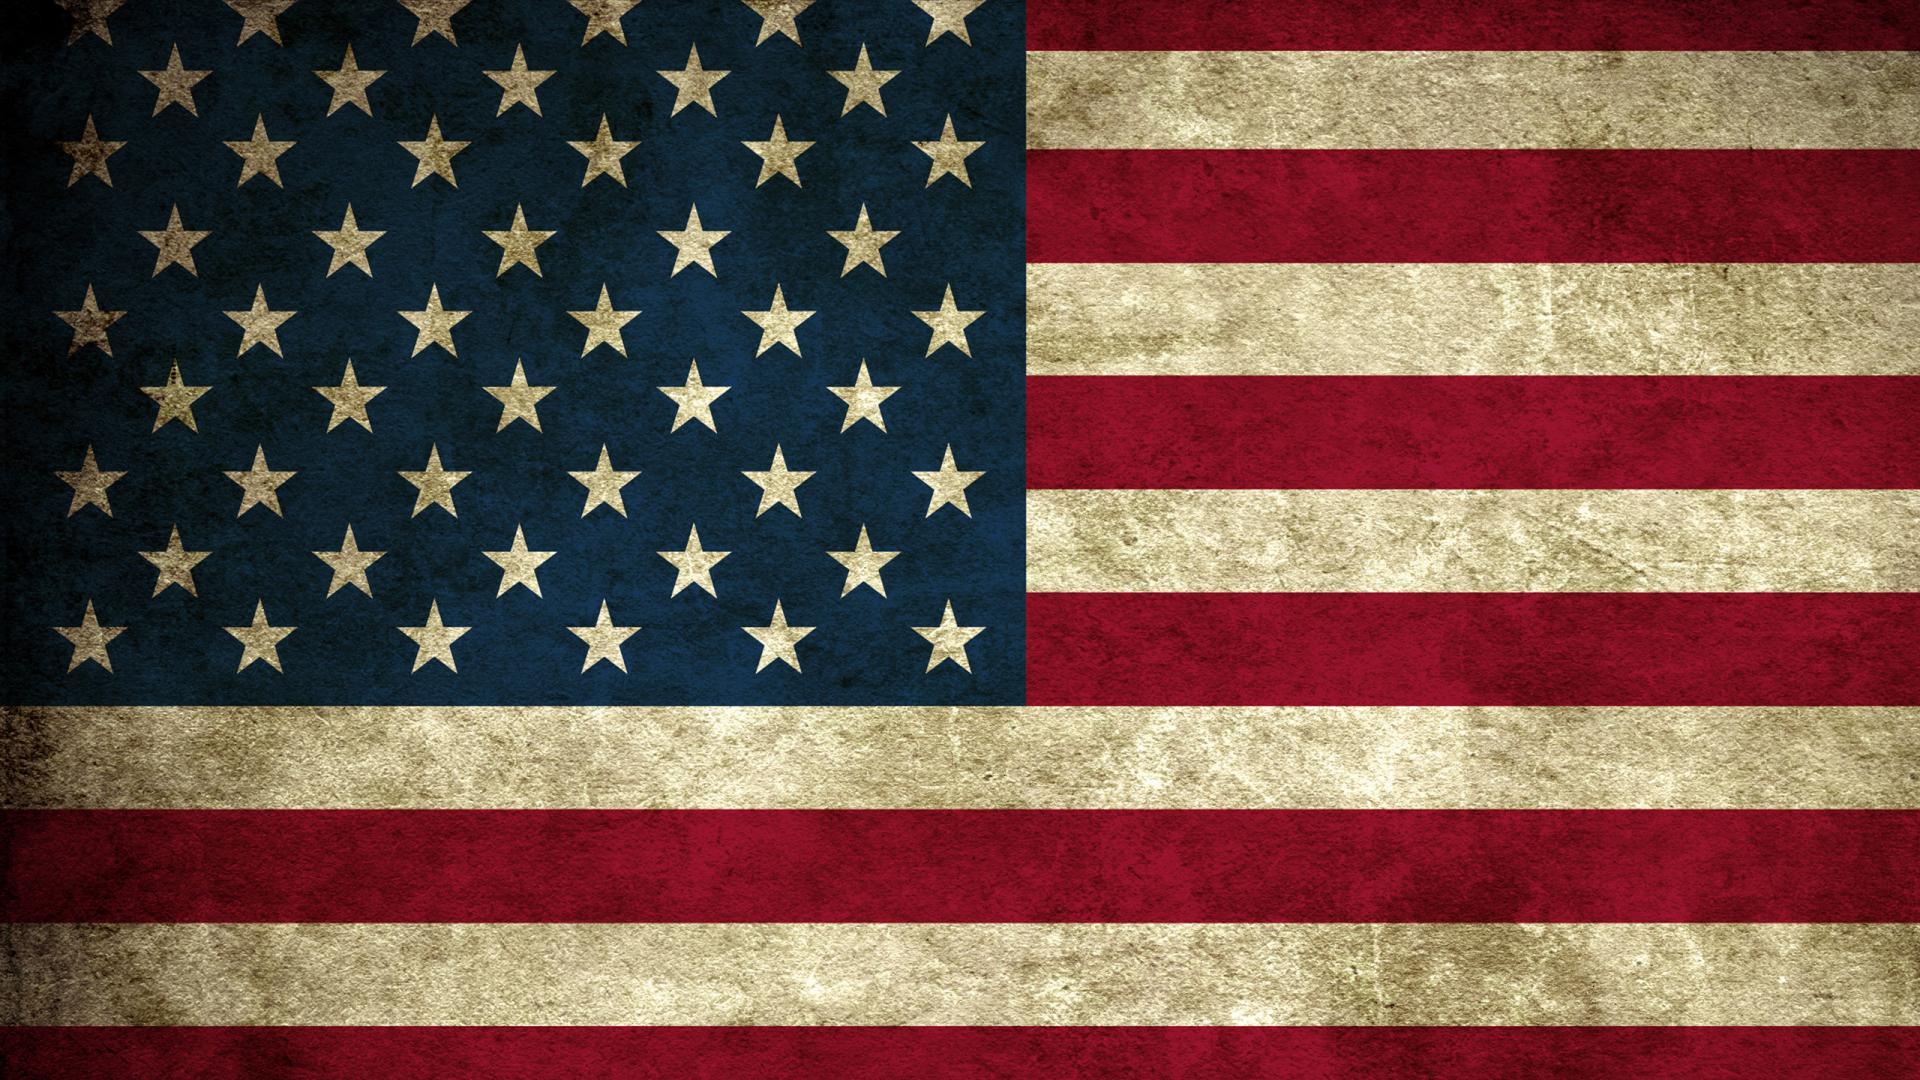 American Flag 1920x1080